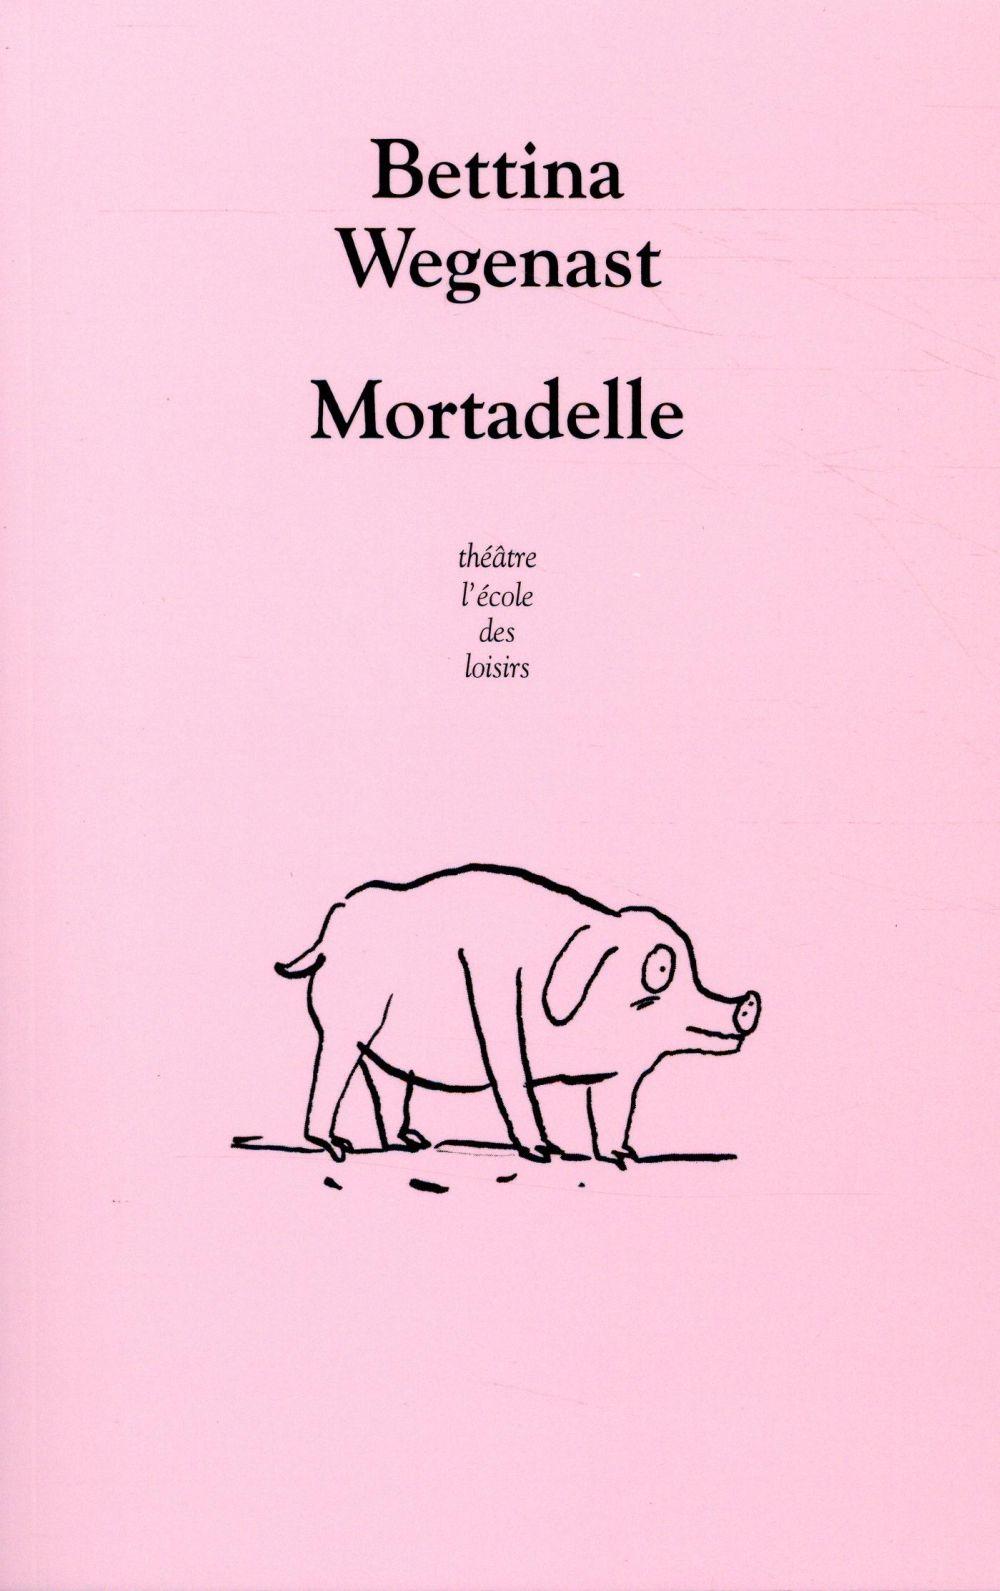 Mortadelle